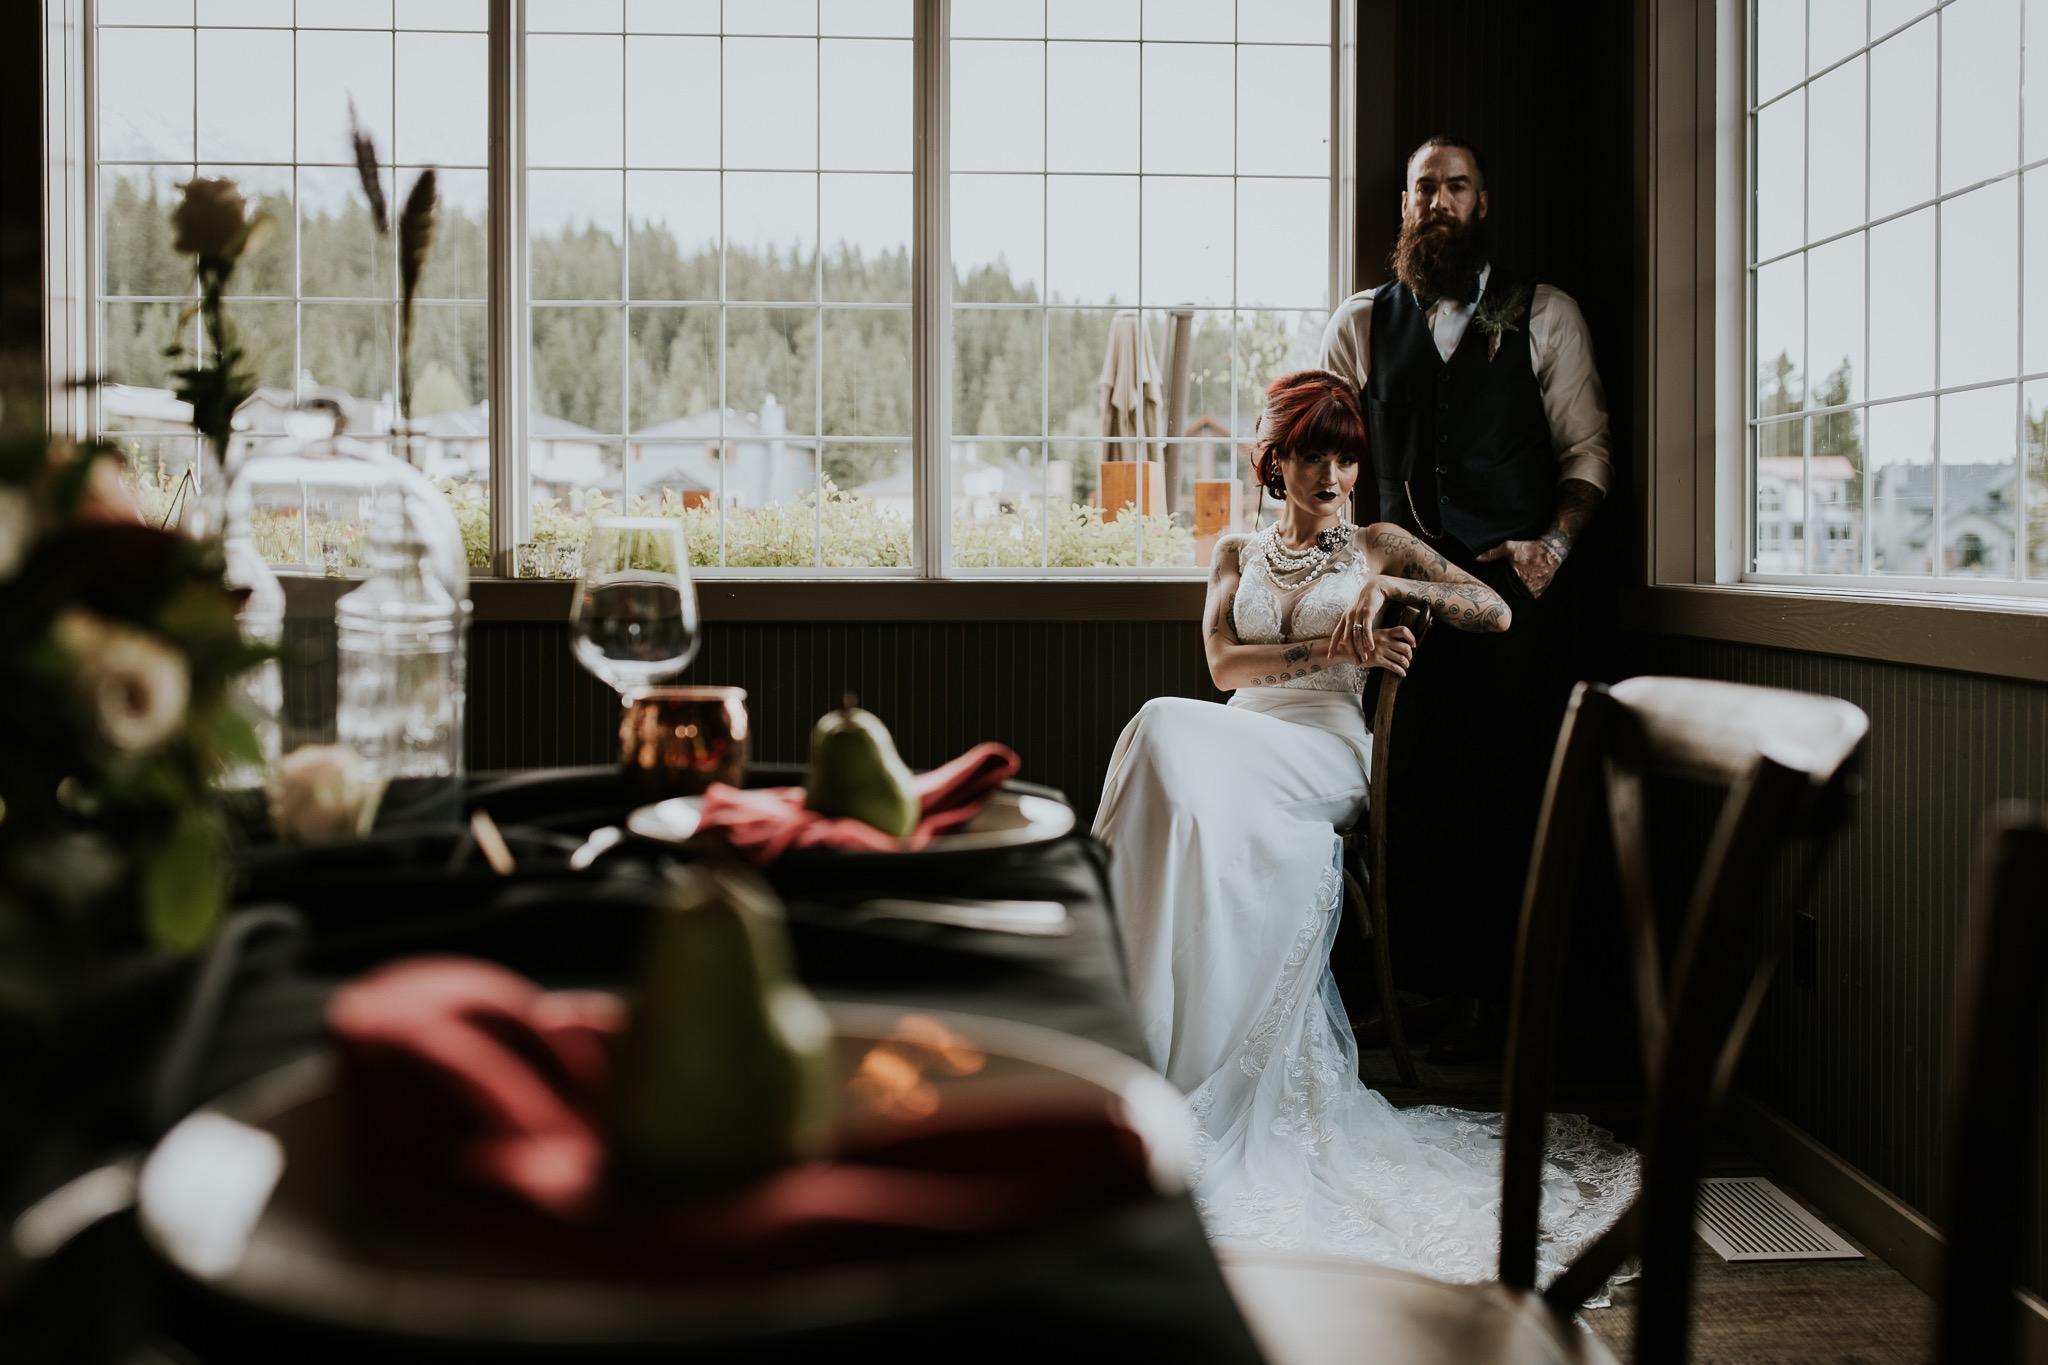 20170915-canmore-moody-wedding-photographer-creekside-creeksidestyledshoot-time&fate-4740